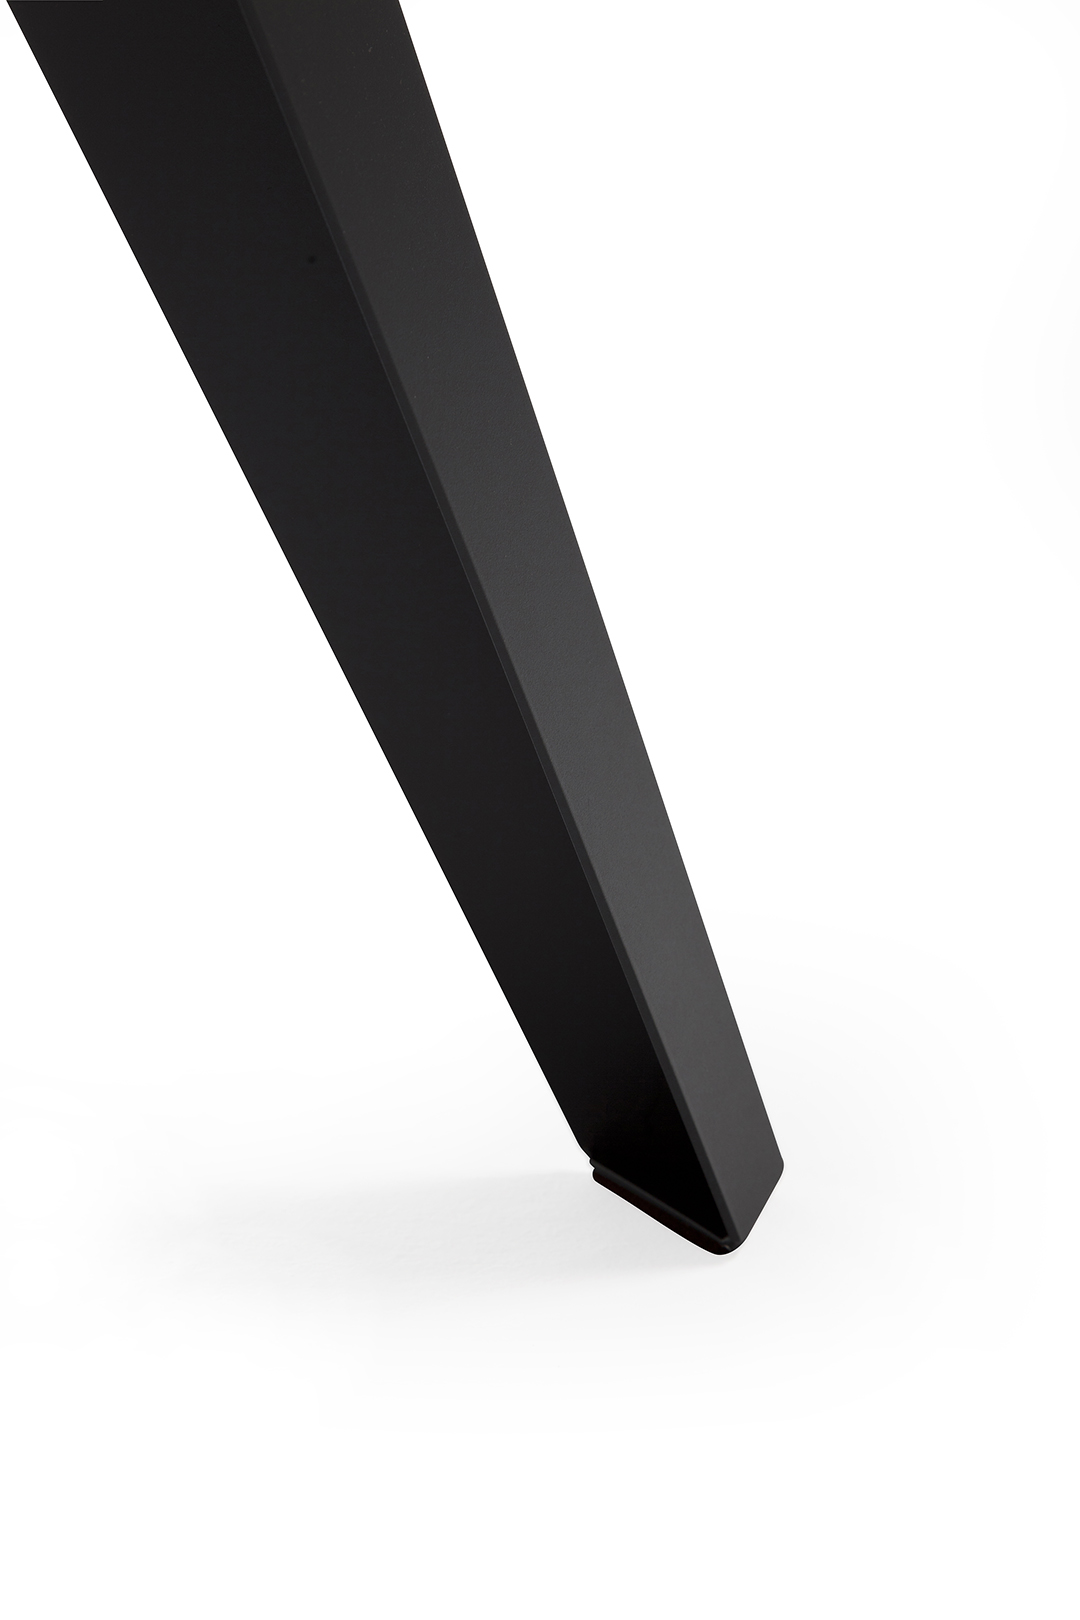 Ronde Tafel 130 Hoeveel Personen.Ronde Eettafel Belly L Kees Marcelis L Odesi Your Dutch Design